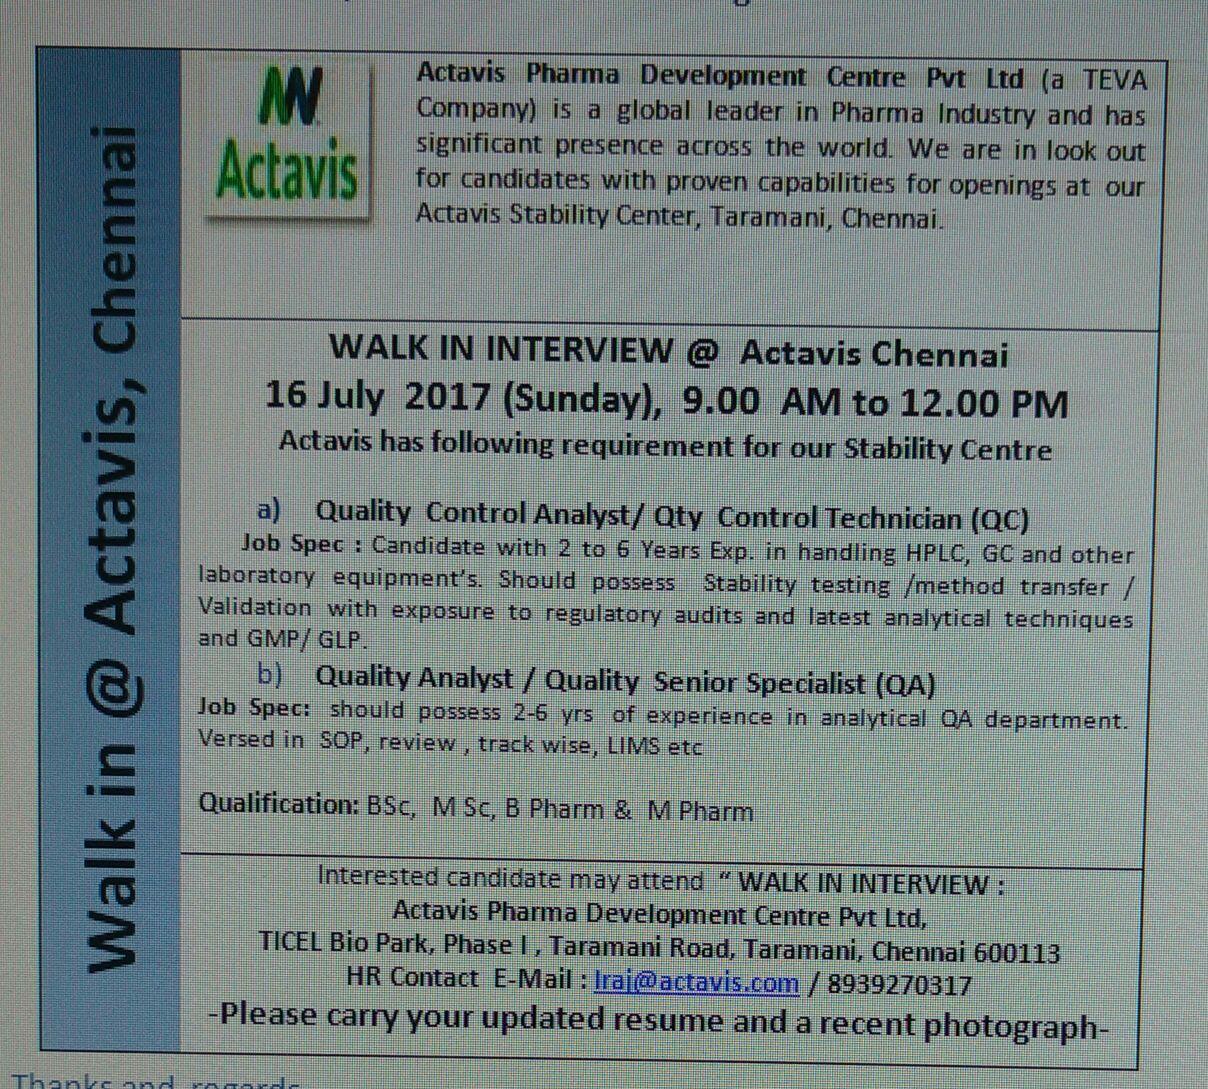 Actavis Pharmaceuticals Jobs | Jobs2Careers